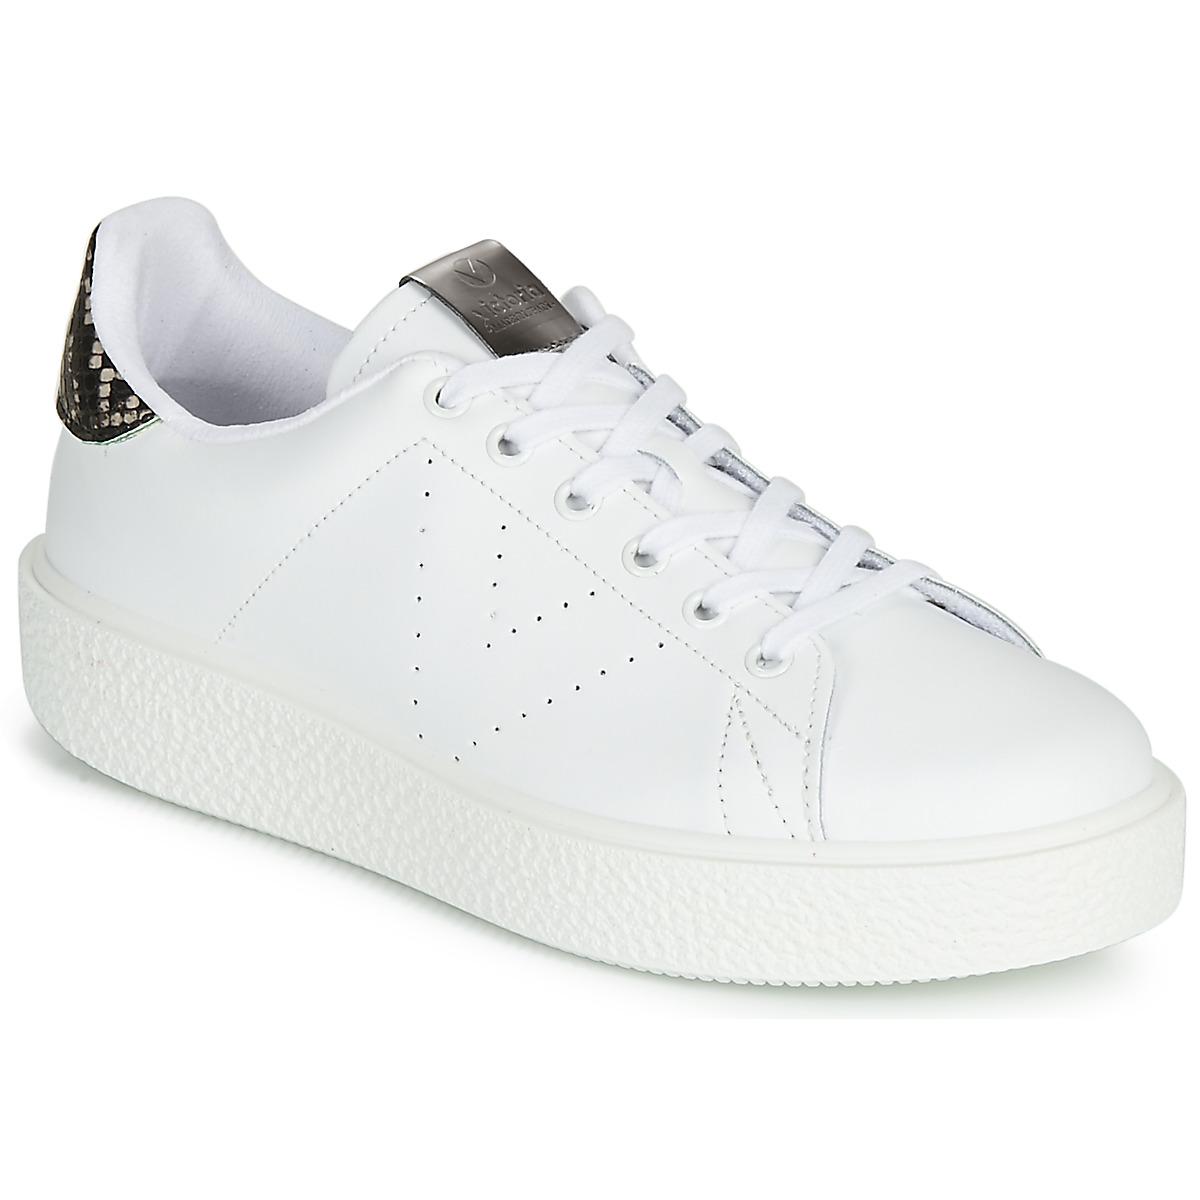 Sneakers Victoria  UTOPIA RELIEVE PIEL